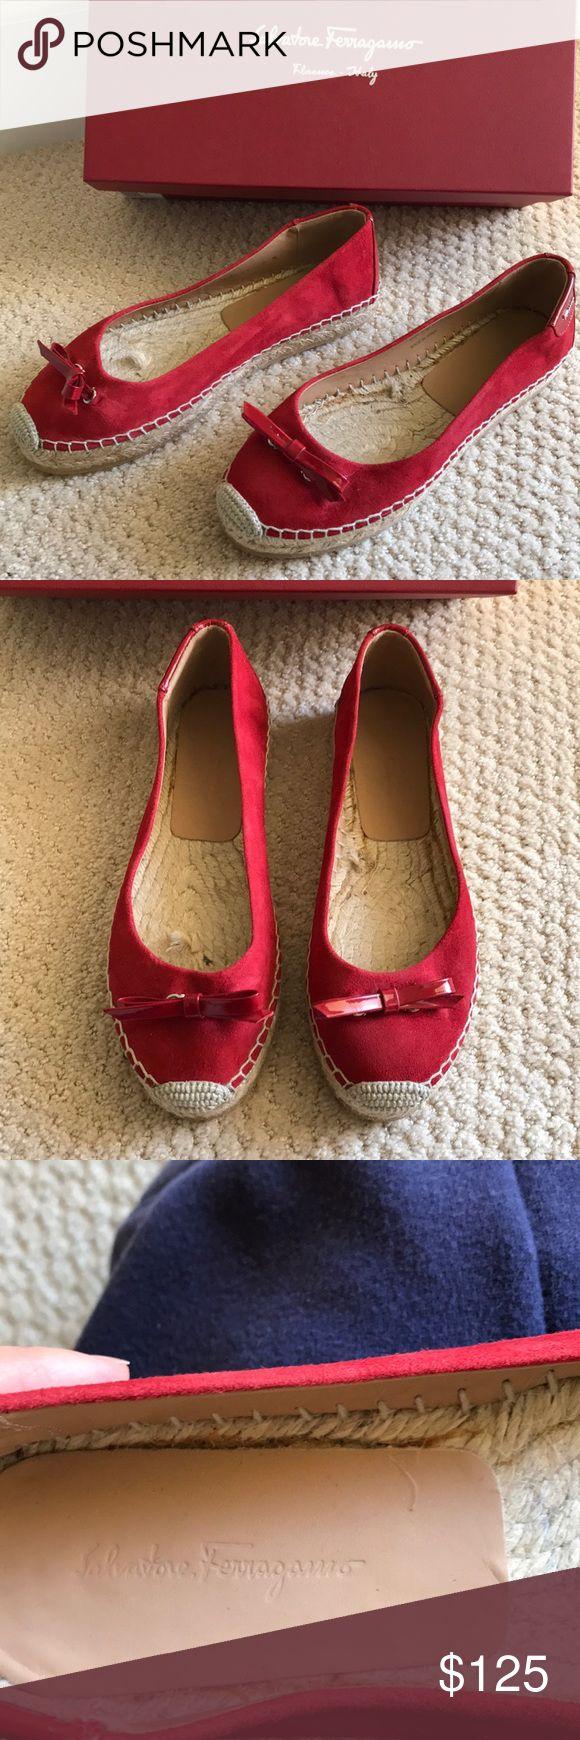 Salvatore Ferragamo espadrilles shoes Adorable red espadrilles by Ferragamo. Never been worn but was a floor sample. Size 7M but runs a little loose. Label detail at ankle area. Ferragamo Shoes Espadrilles